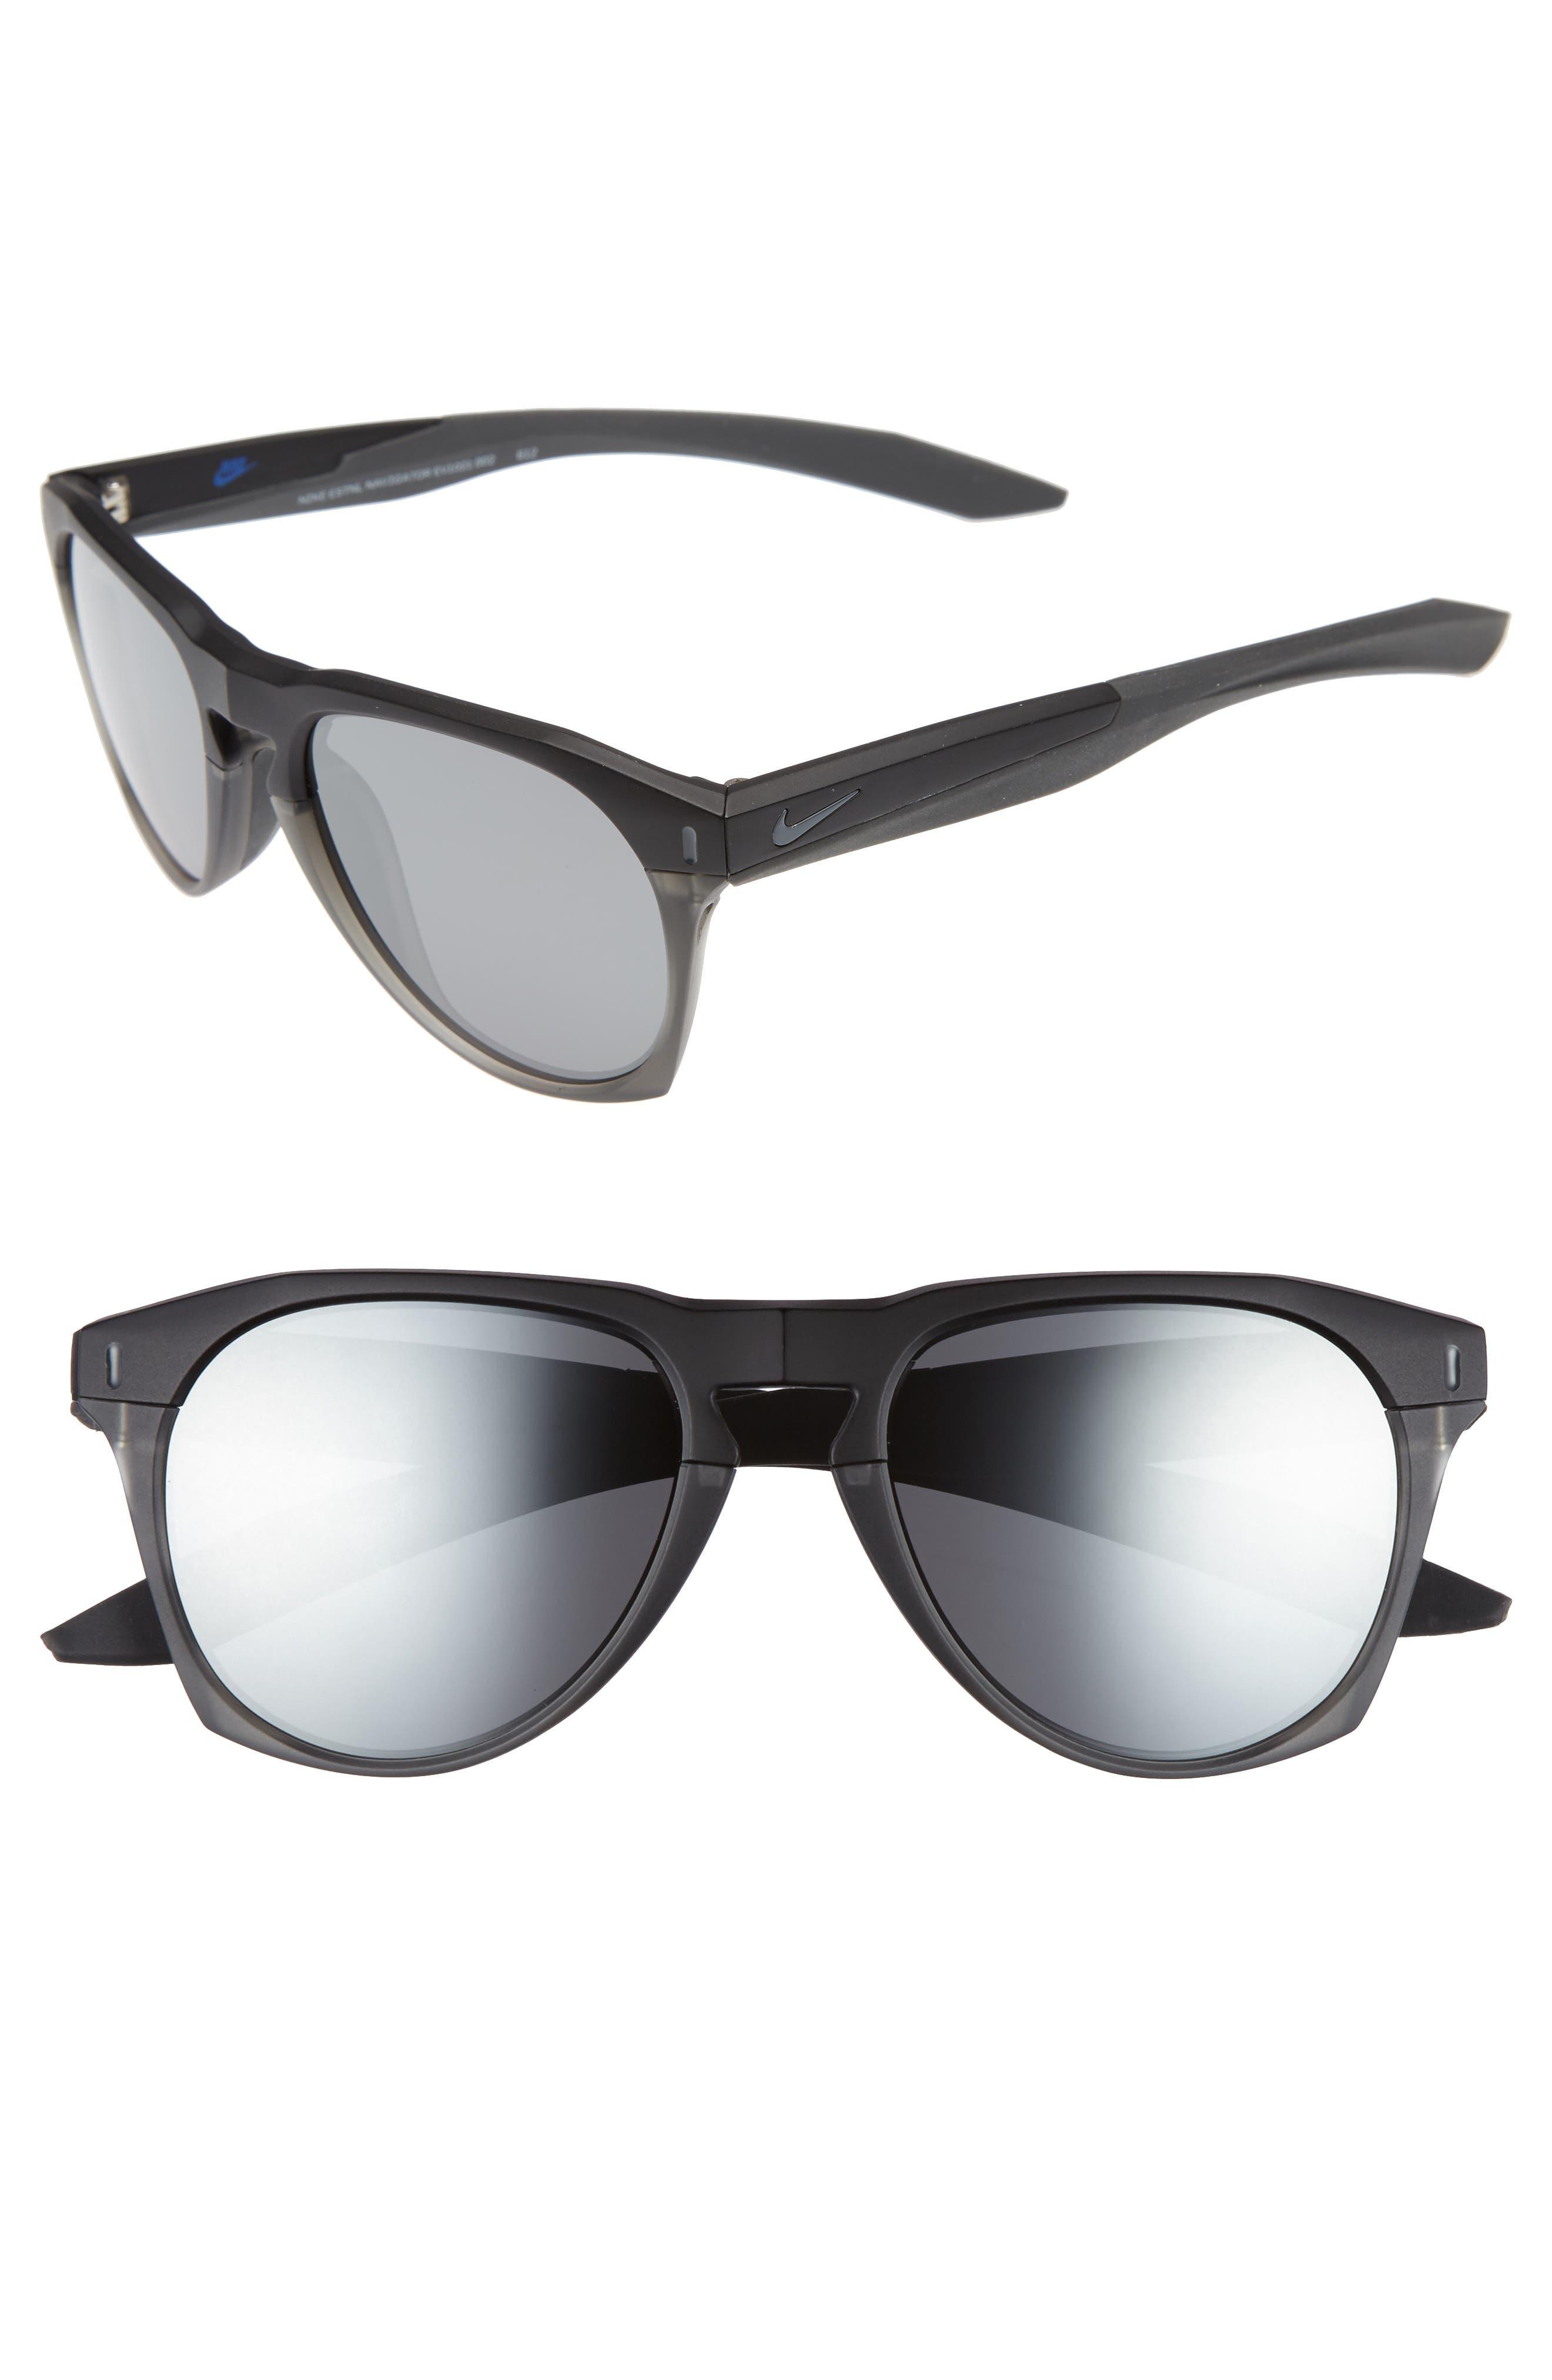 Essential Navigator 54mm Sunglasses,                         Main,                         color, Matte Black / Anthracite